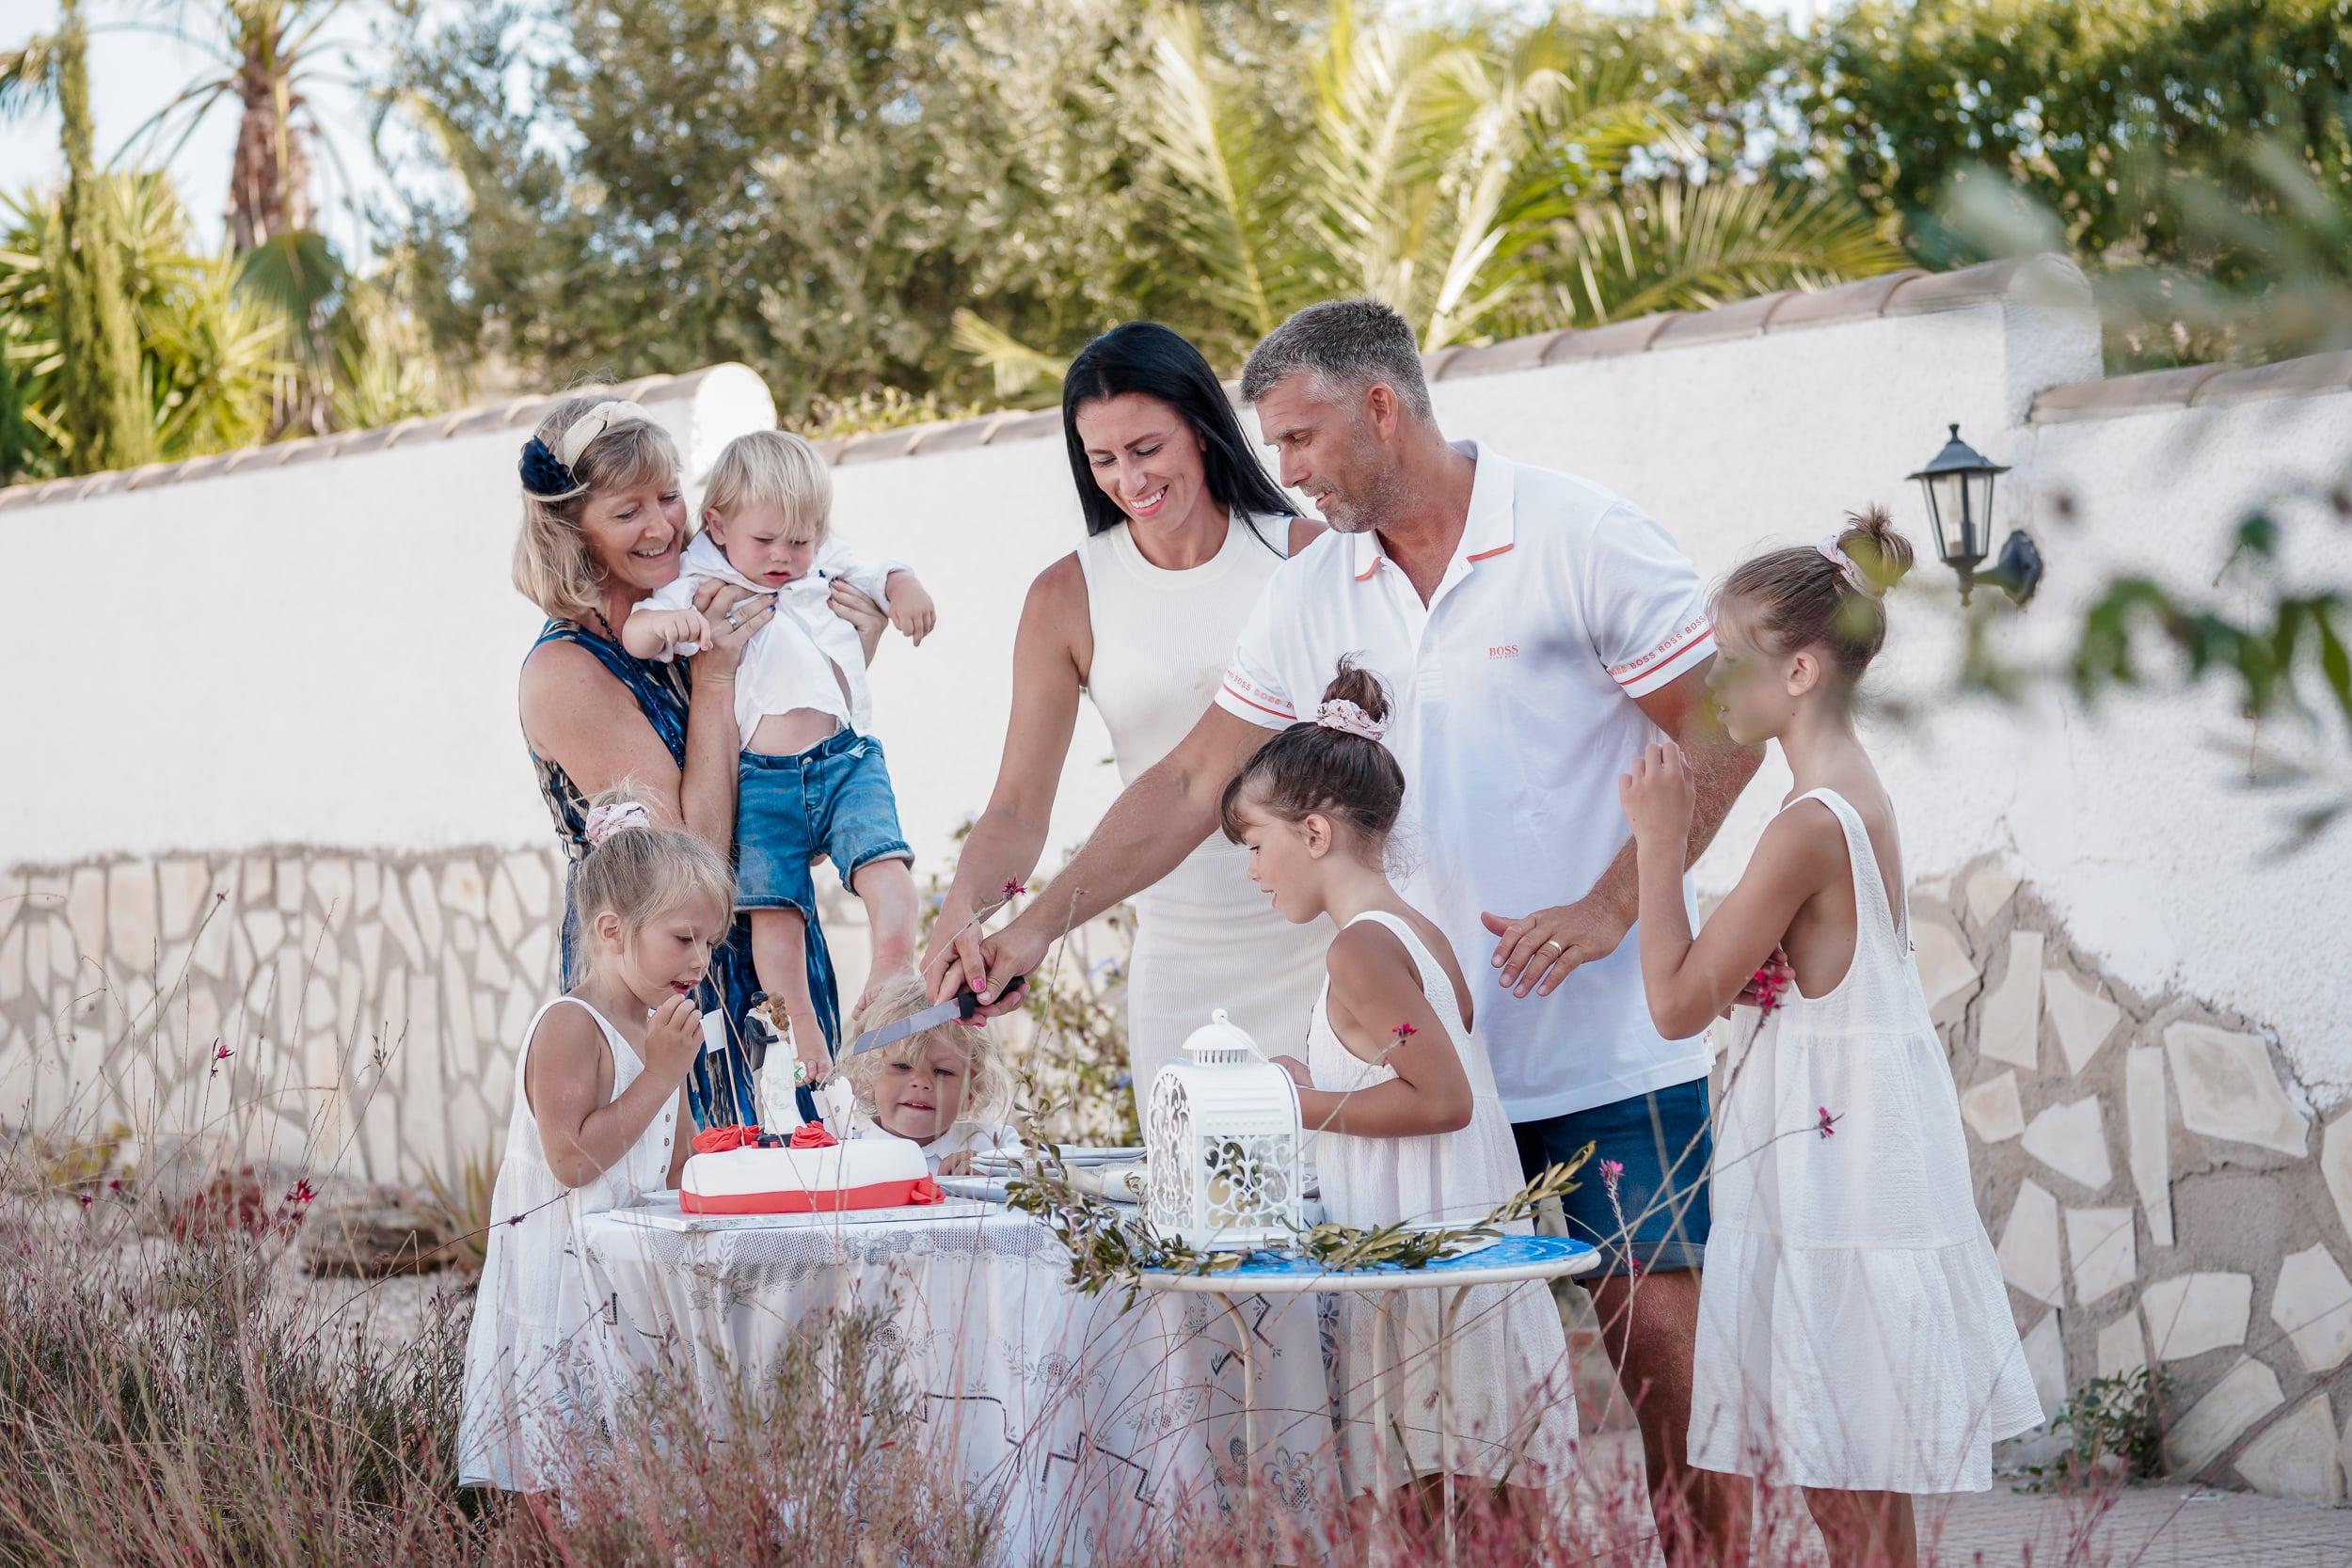 Michal Carbol photo Spain wedding cake with celebrant